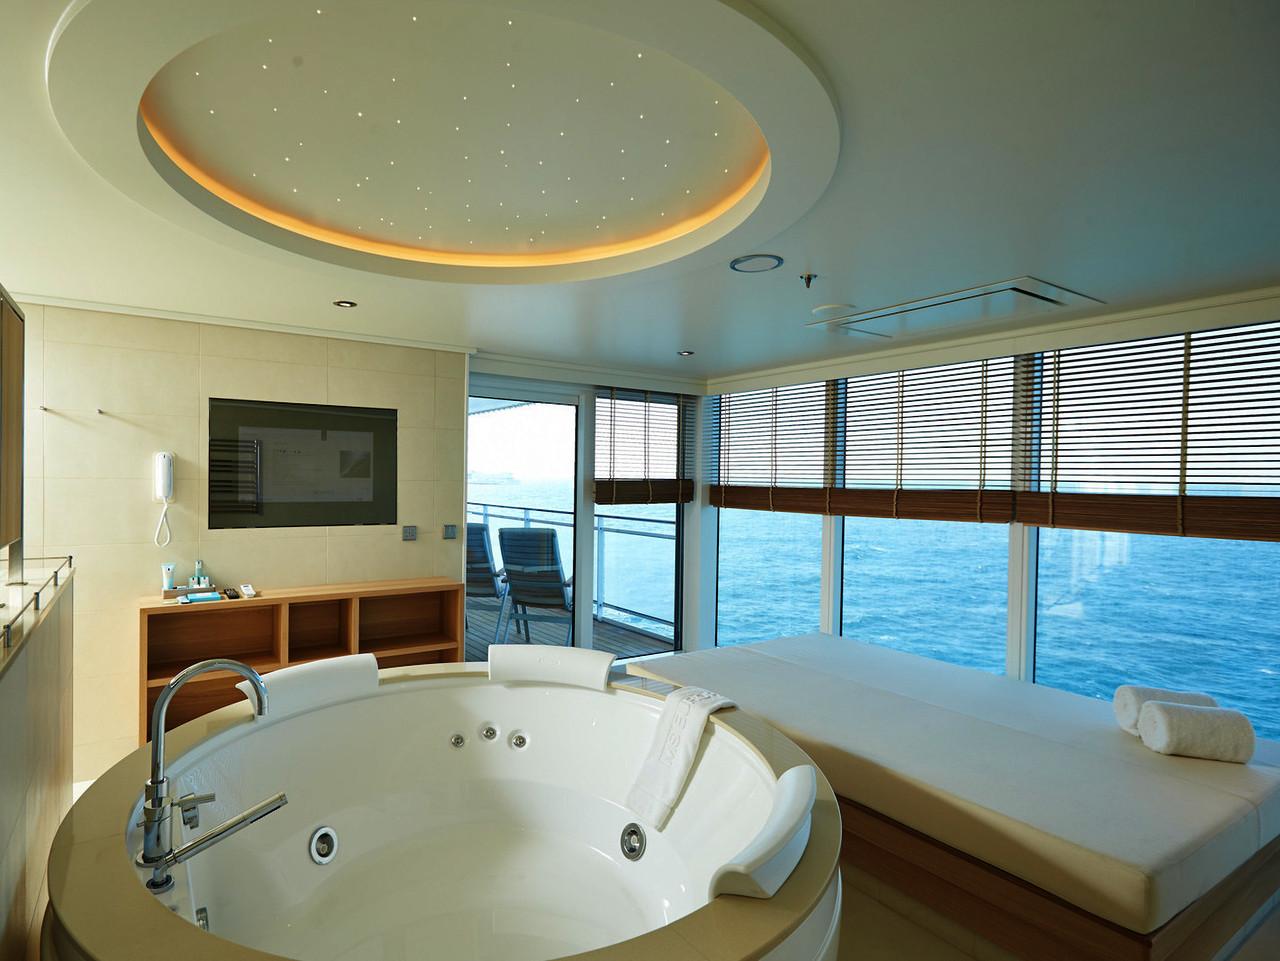 kabinen der ms europa 2 kabinenaustattung guide. Black Bedroom Furniture Sets. Home Design Ideas